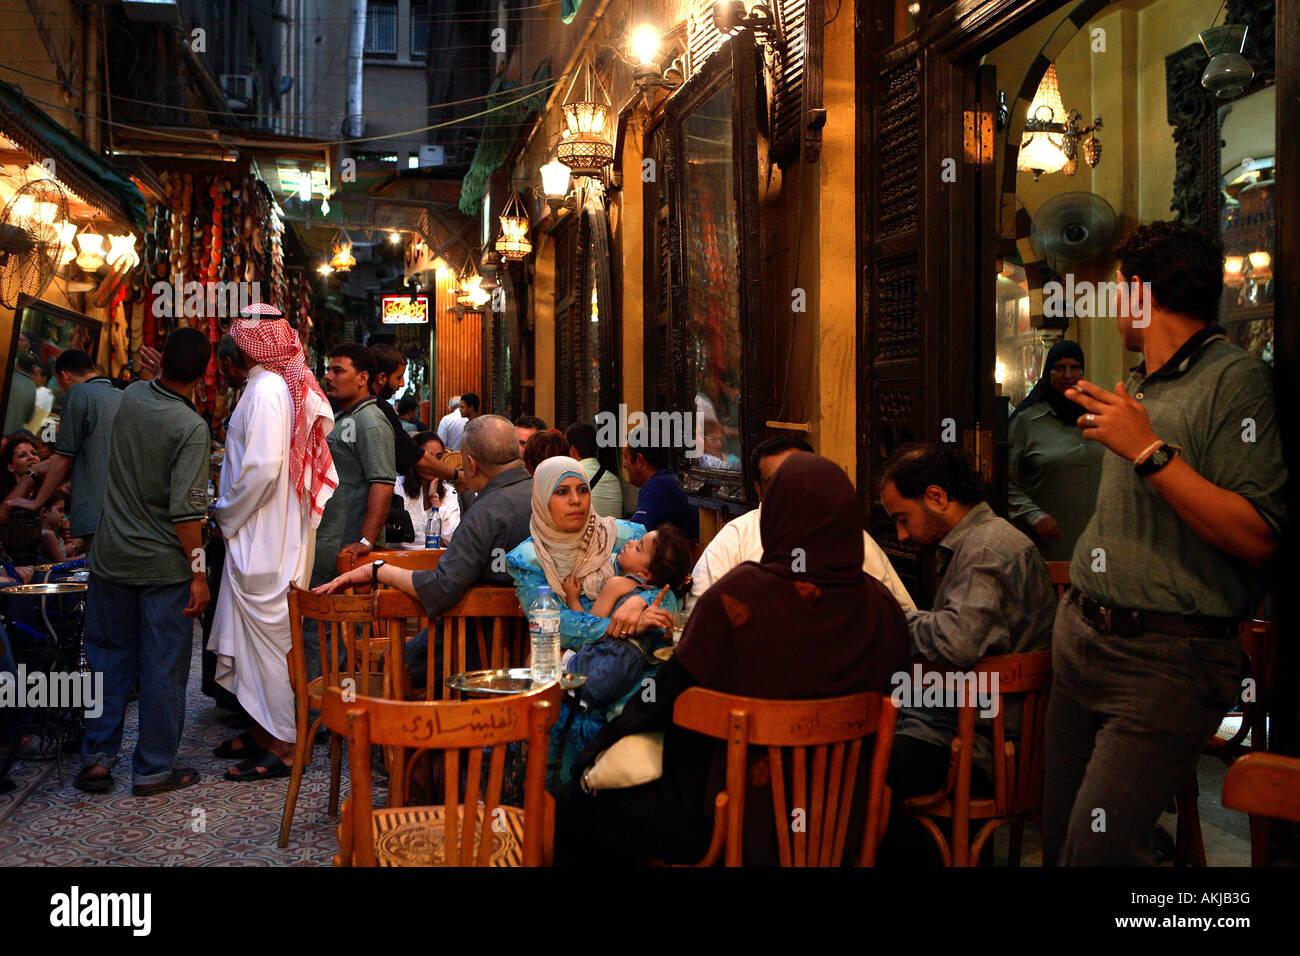 Egypt Cairo Downtown Inside Khan El Khalili Souk The